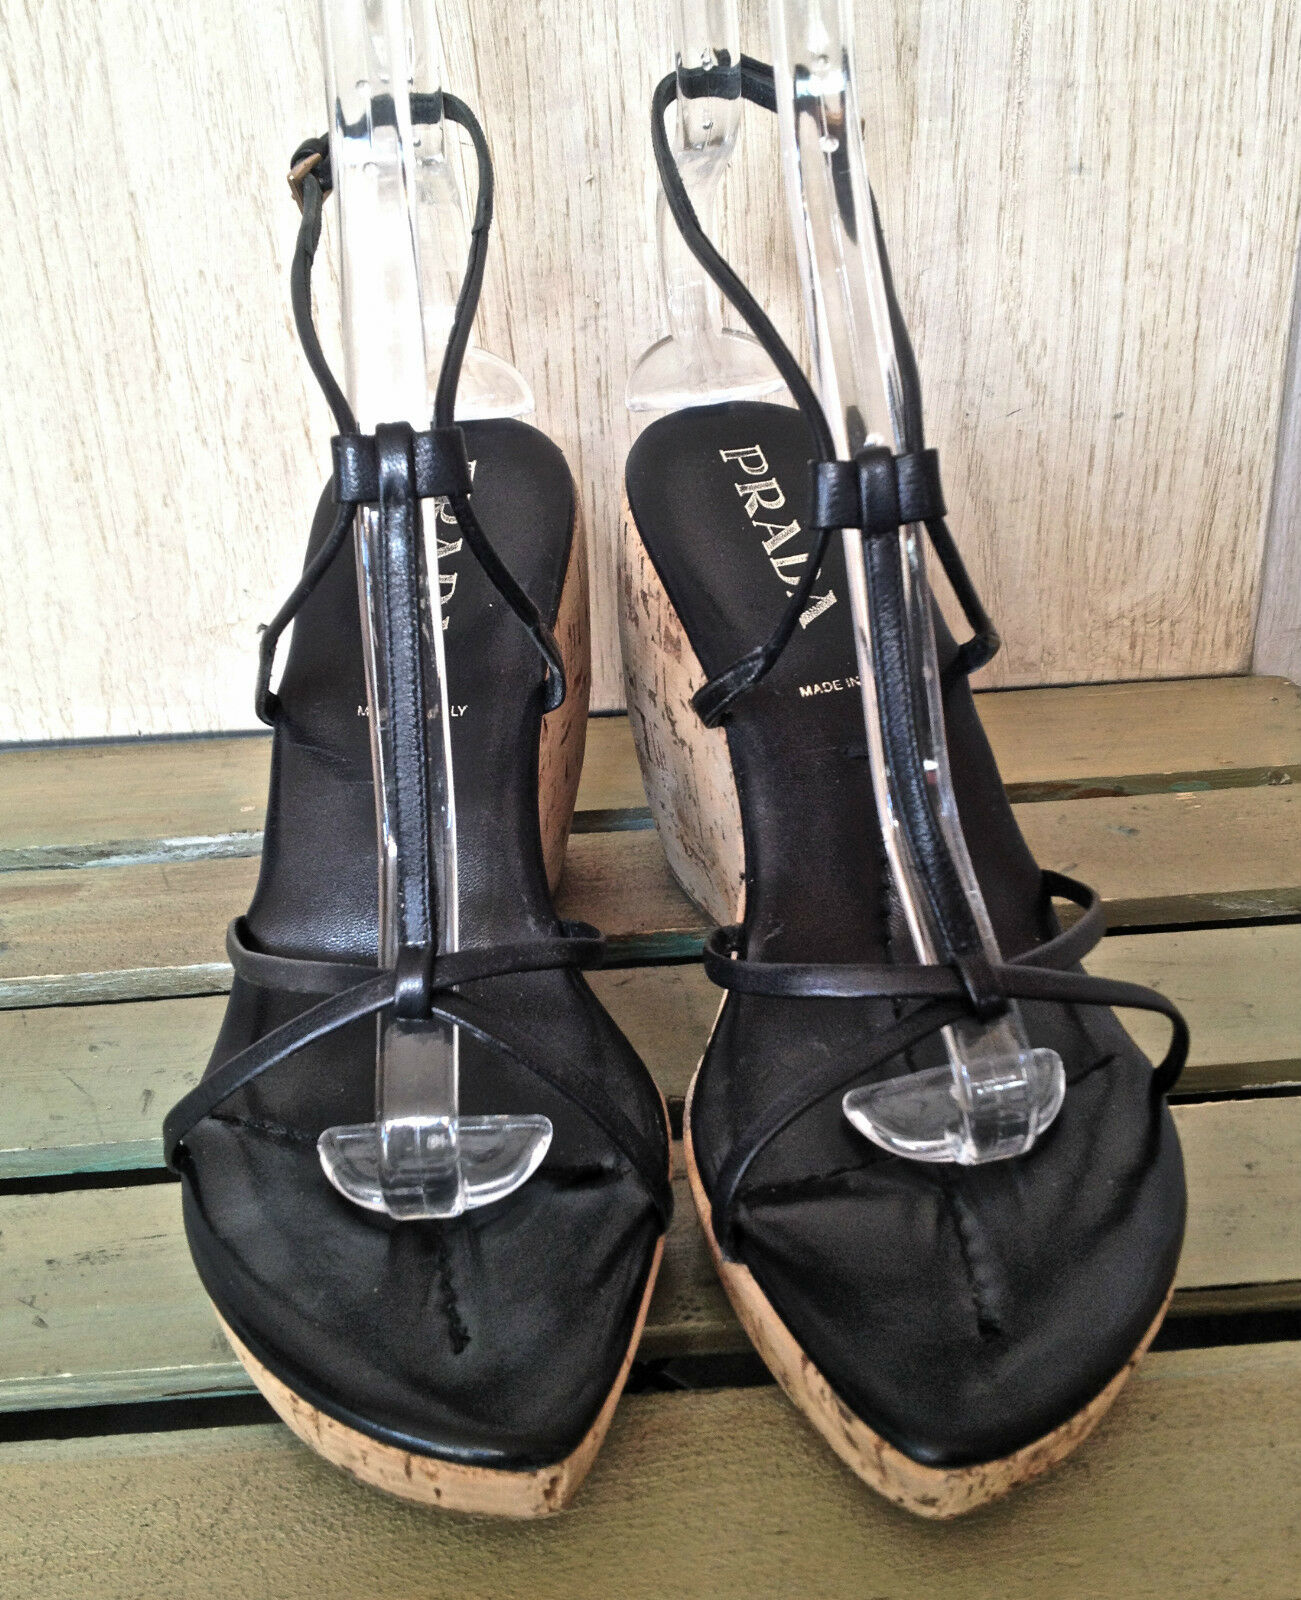 Prada schwarz Leder strappy Sandales tan cork platform wedge 41.5 NEAR PERFECT 41.5 wedge 3b7a21